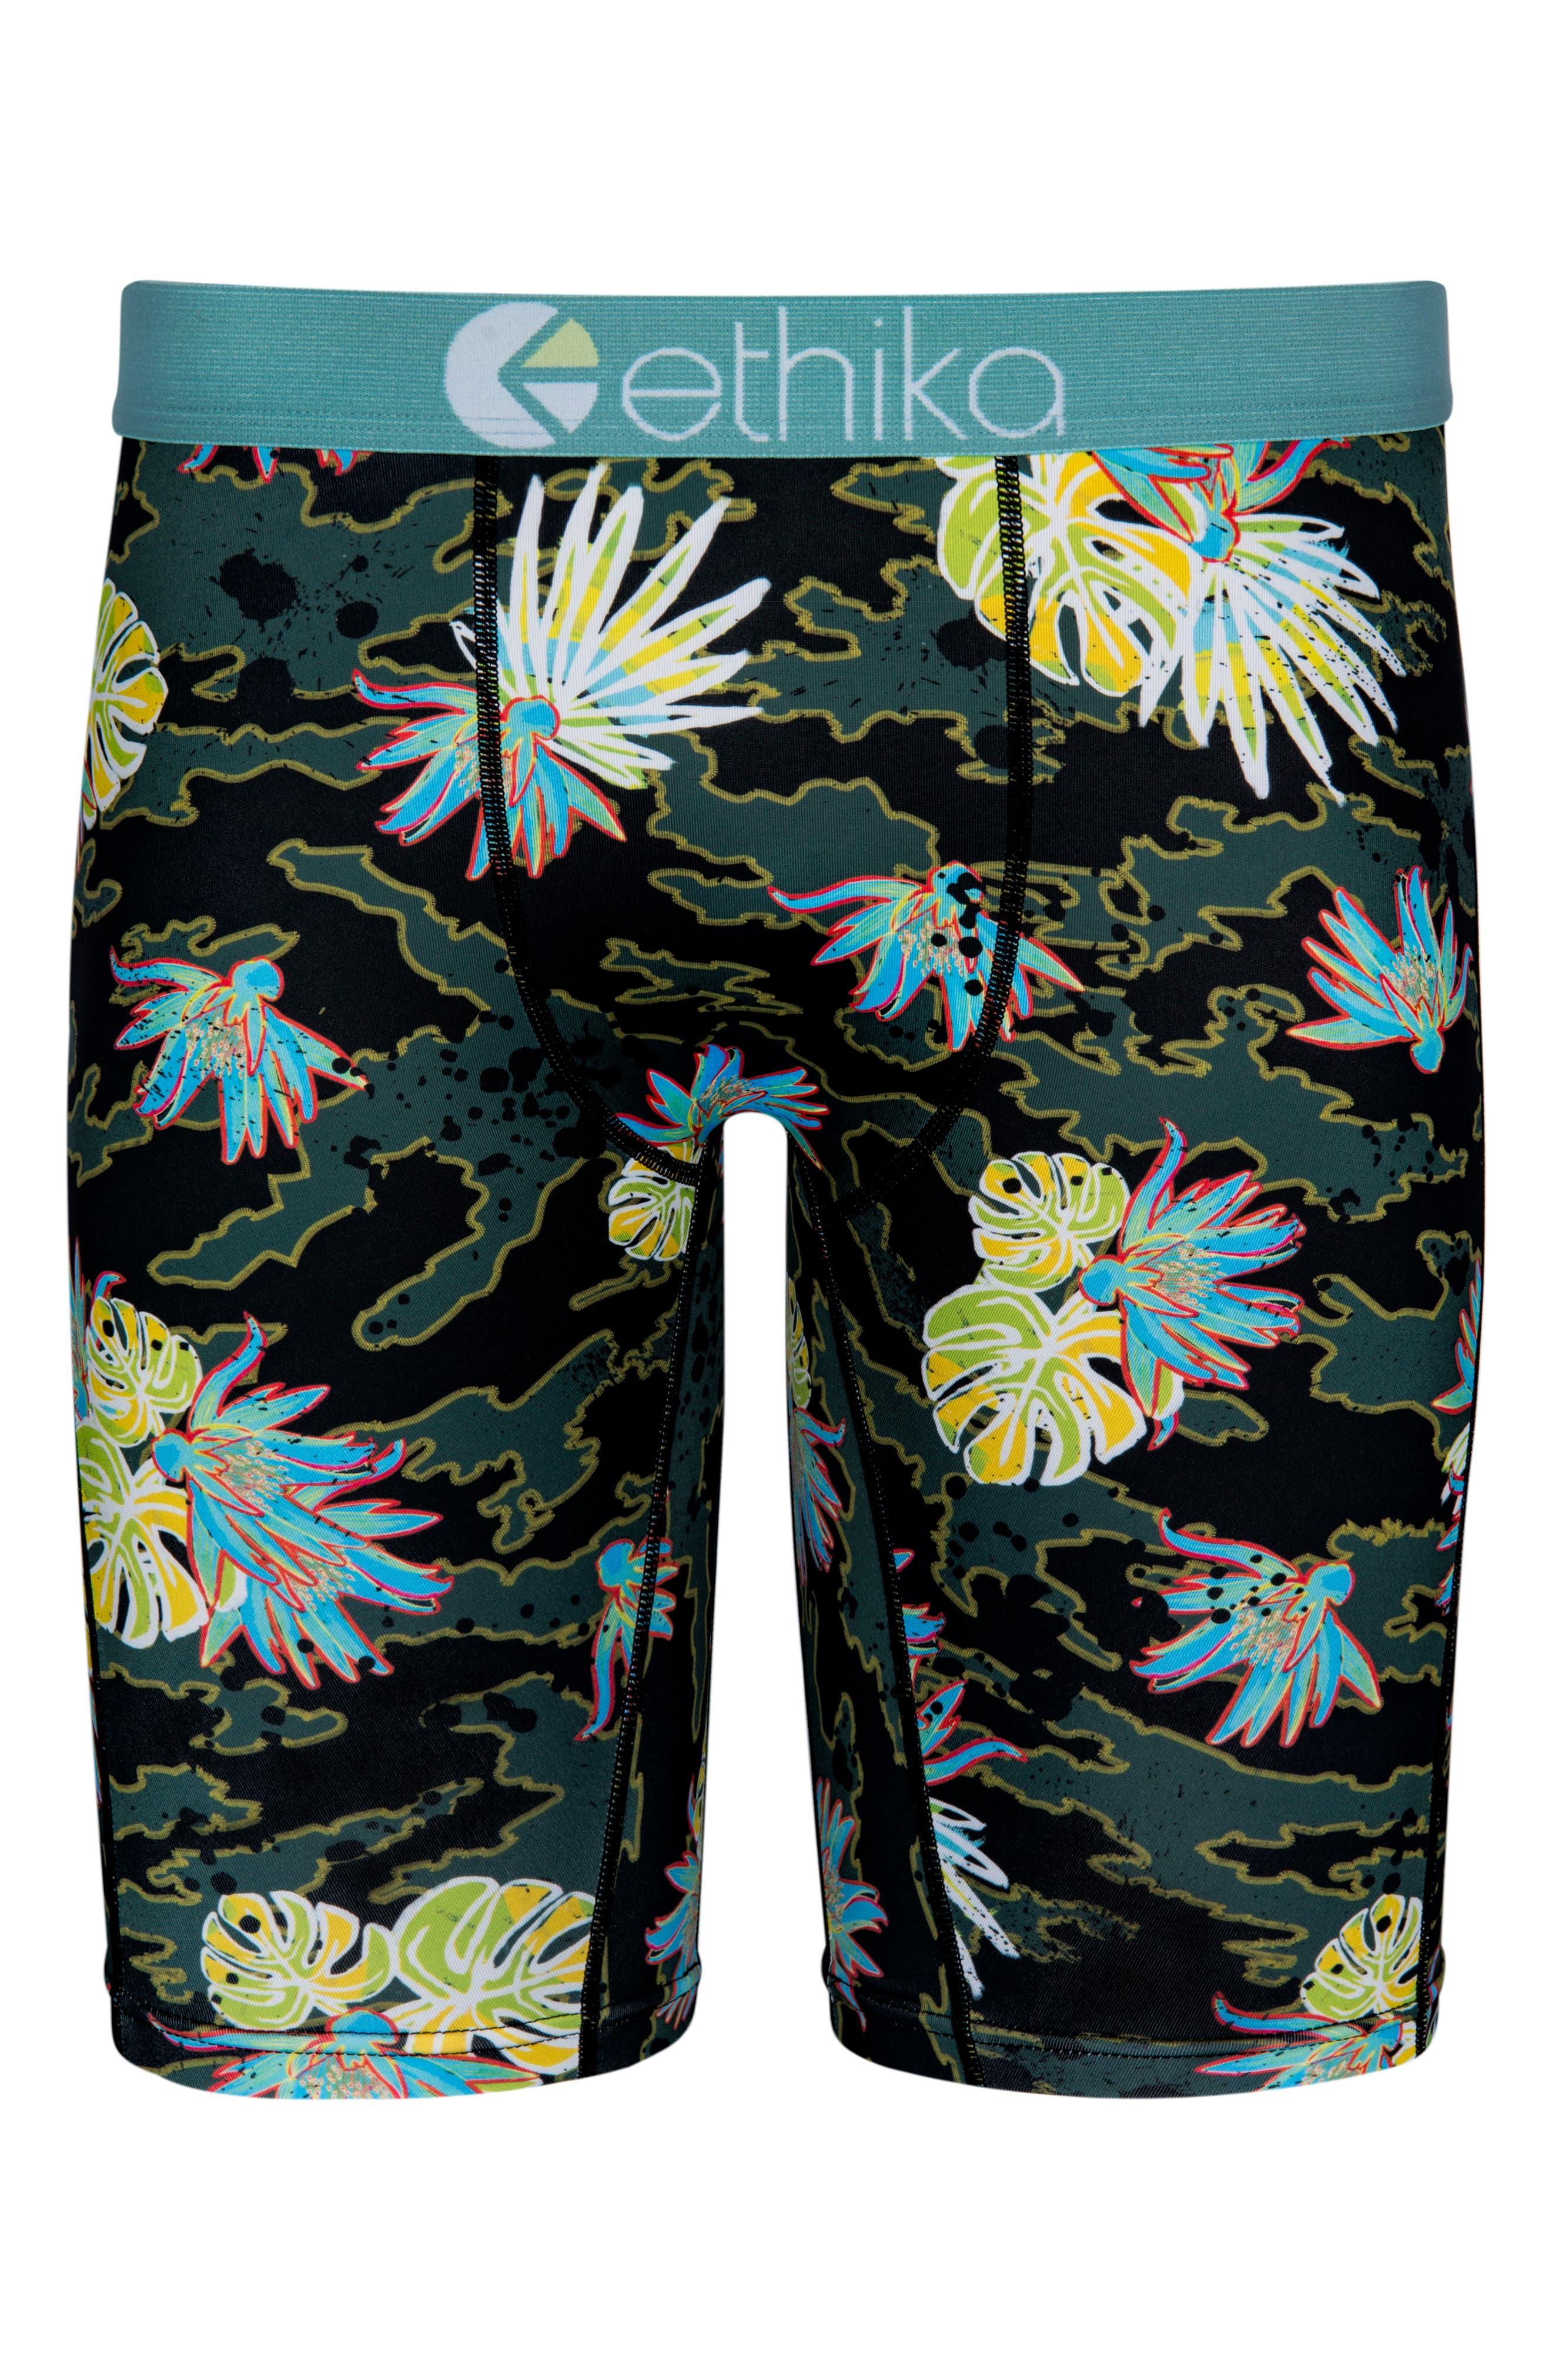 Cammo Paradise Stretch Boxer Briefs,                             Main thumbnail 1, color,                             300